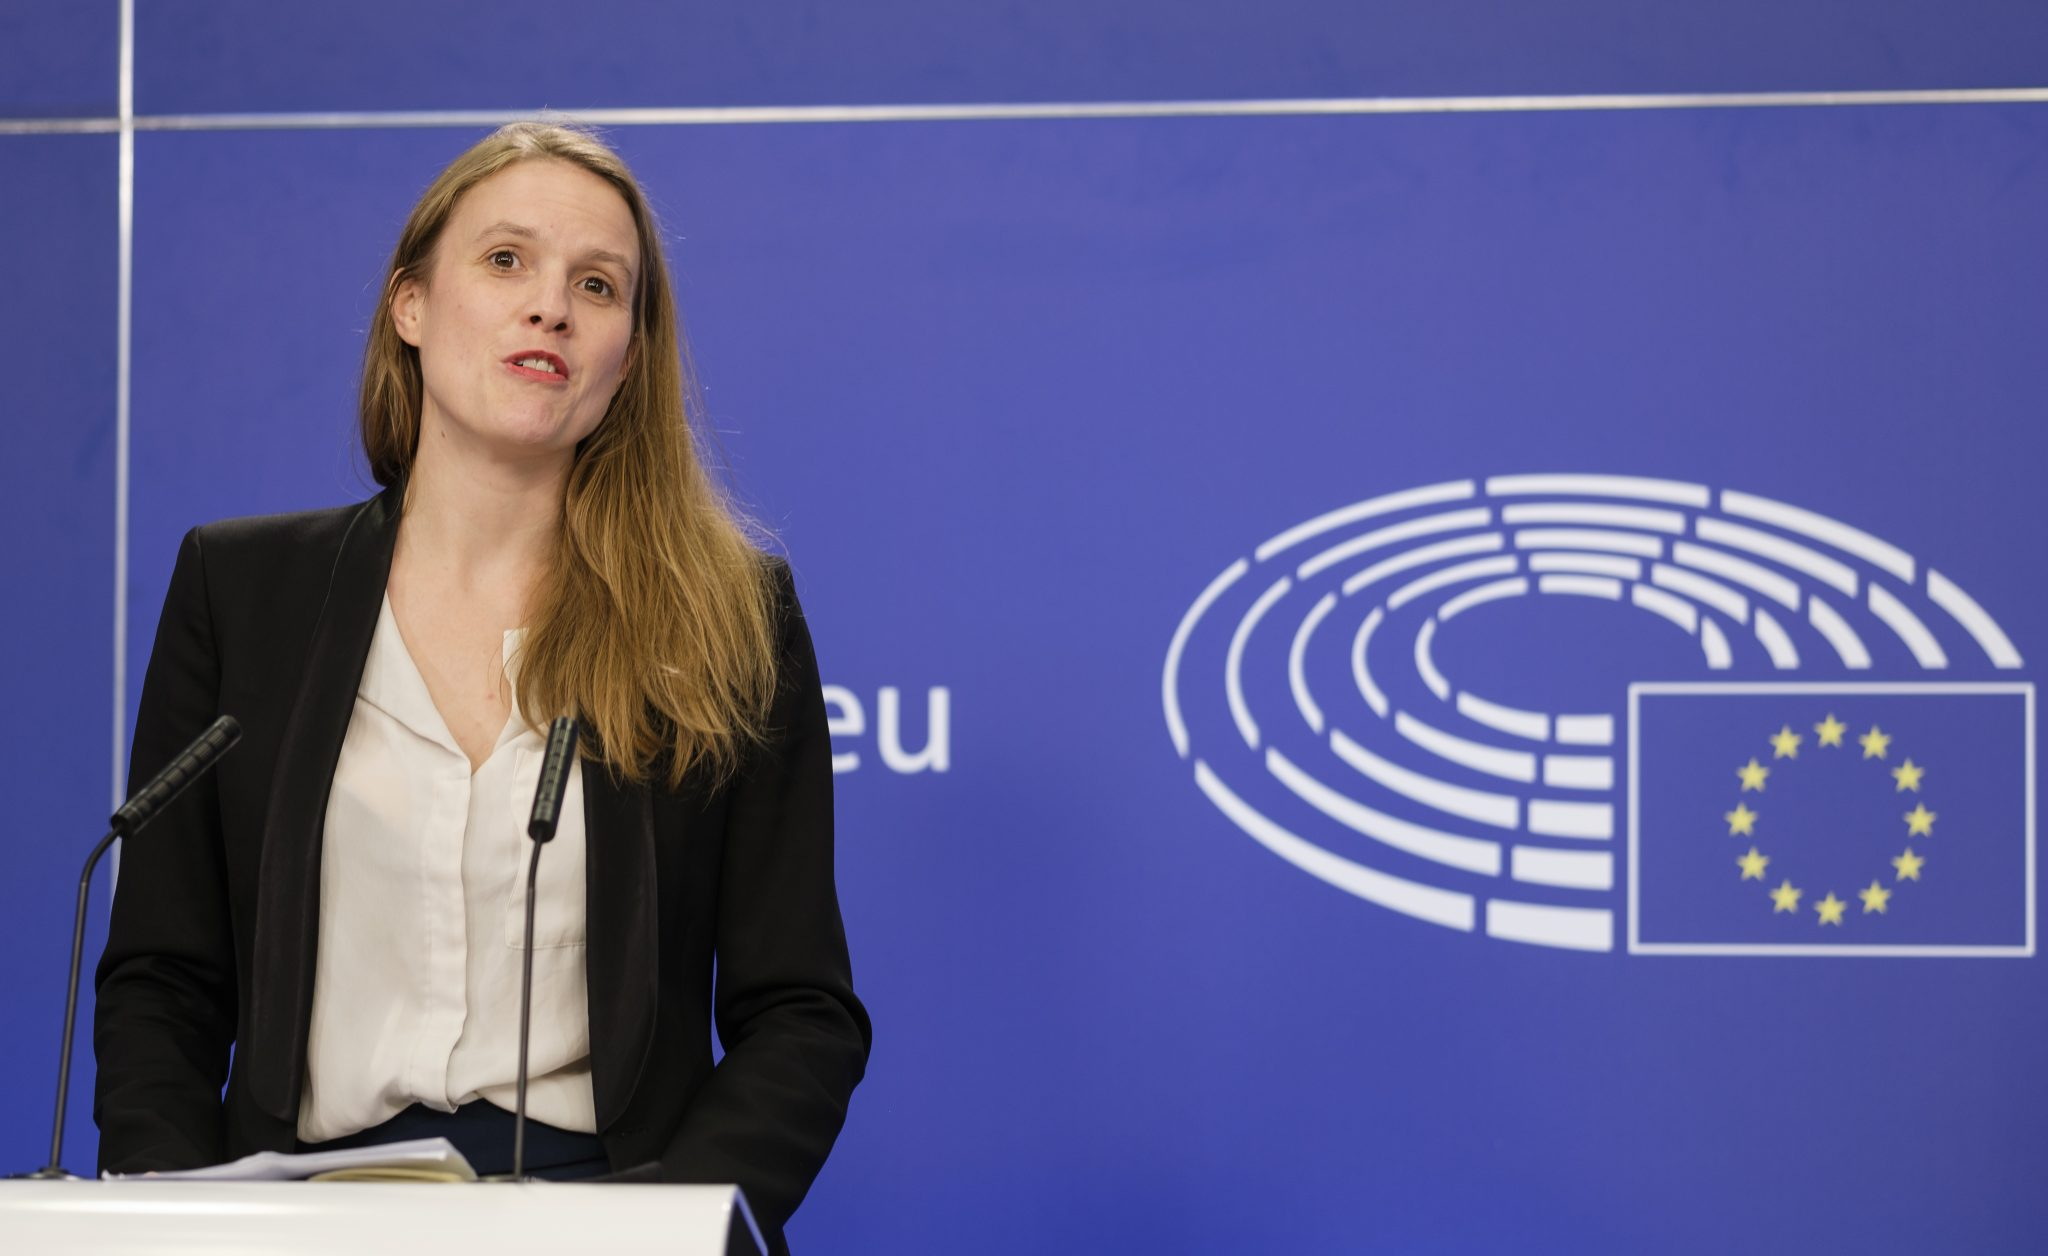 EU-Abgeordnete Terry Reintke (Grüne) in Brüssel: Kritk an polnischem Abtreibungsrecht